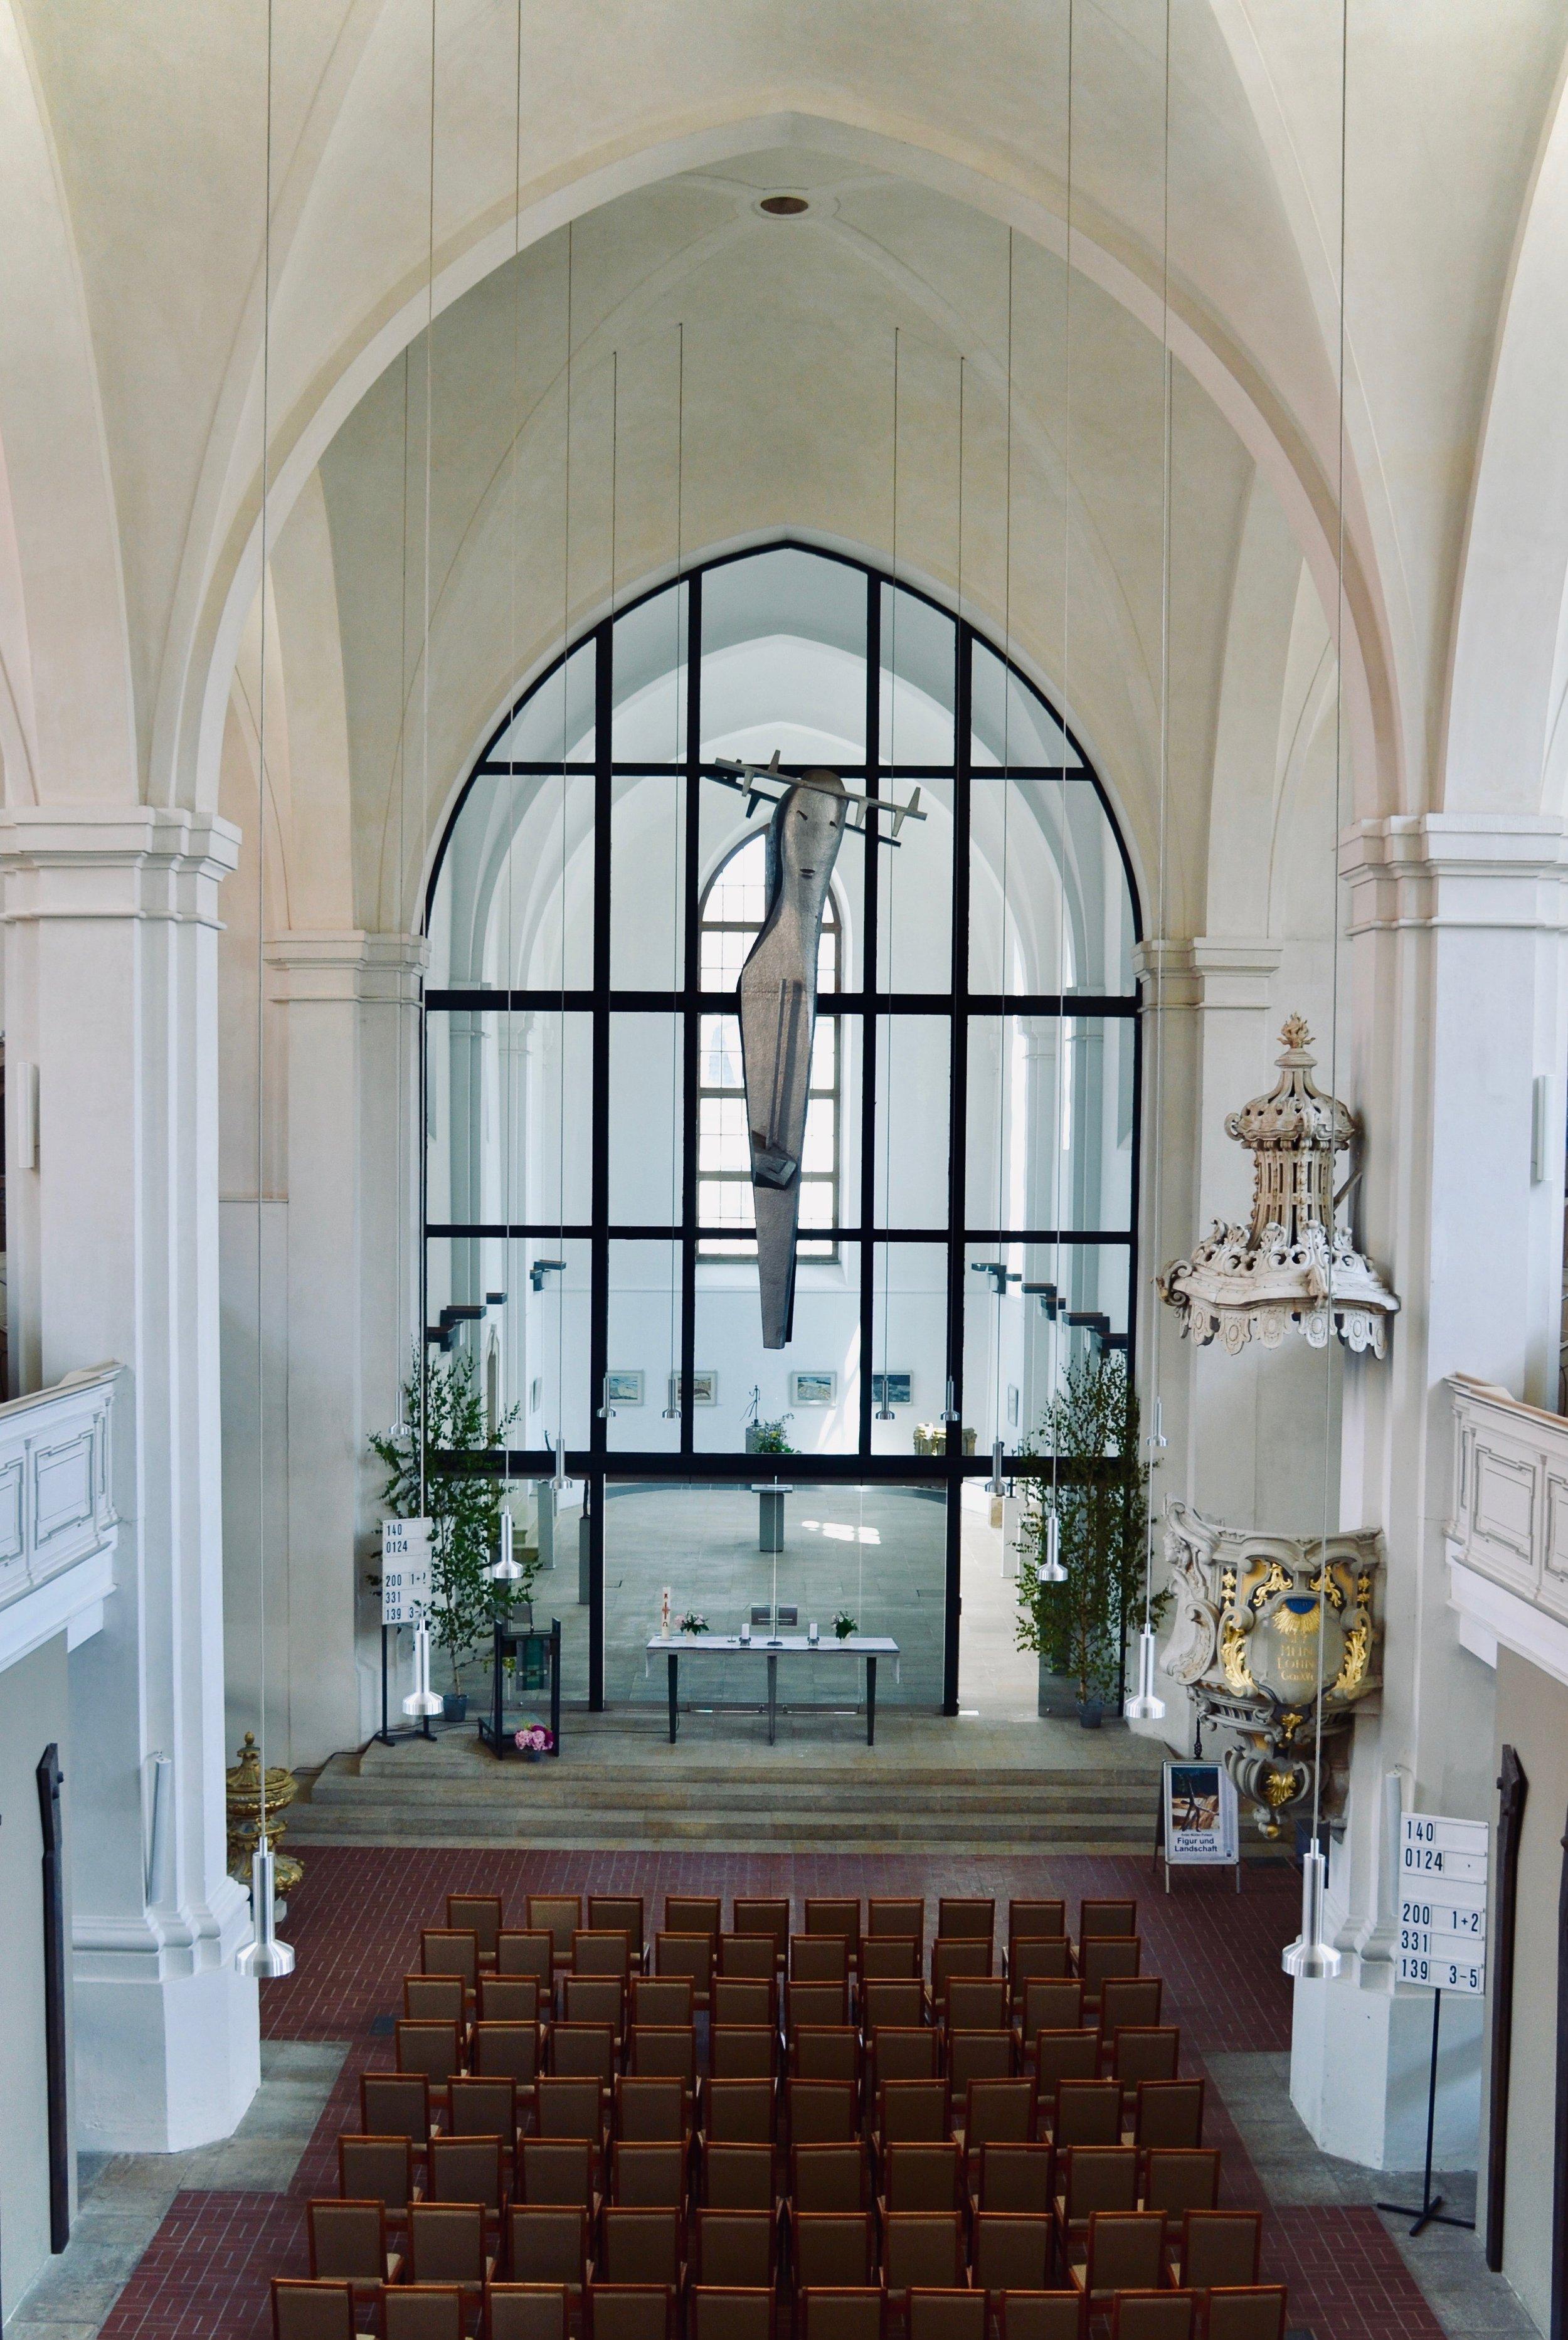 Petrikirche, Freiberg, Germany.